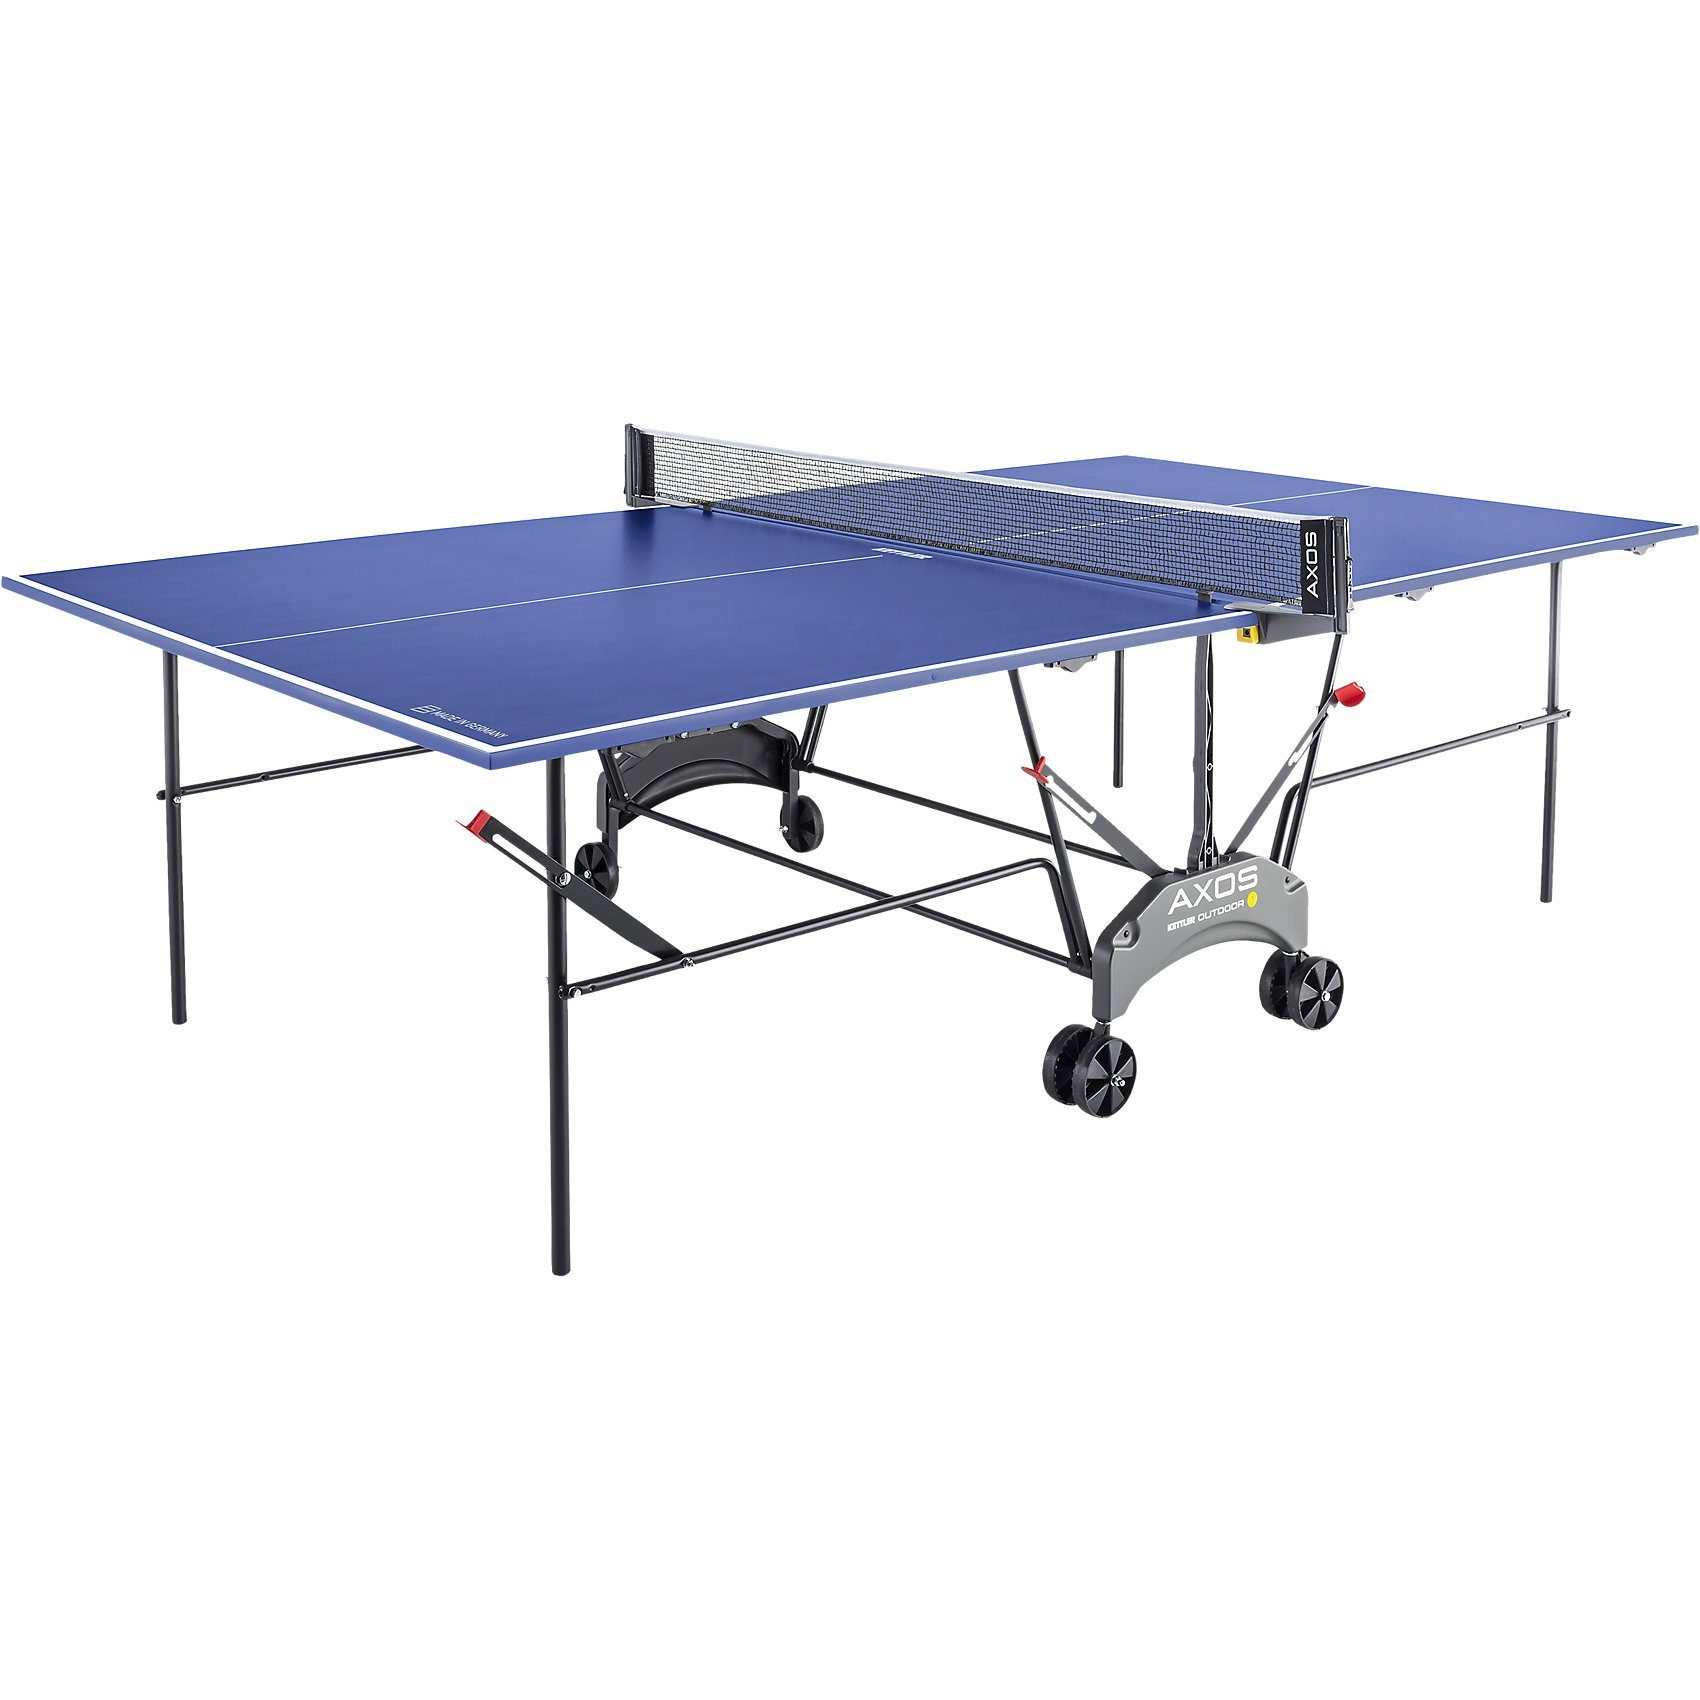 Kettler TT-Tisch AXOS Outdoor 1, blau